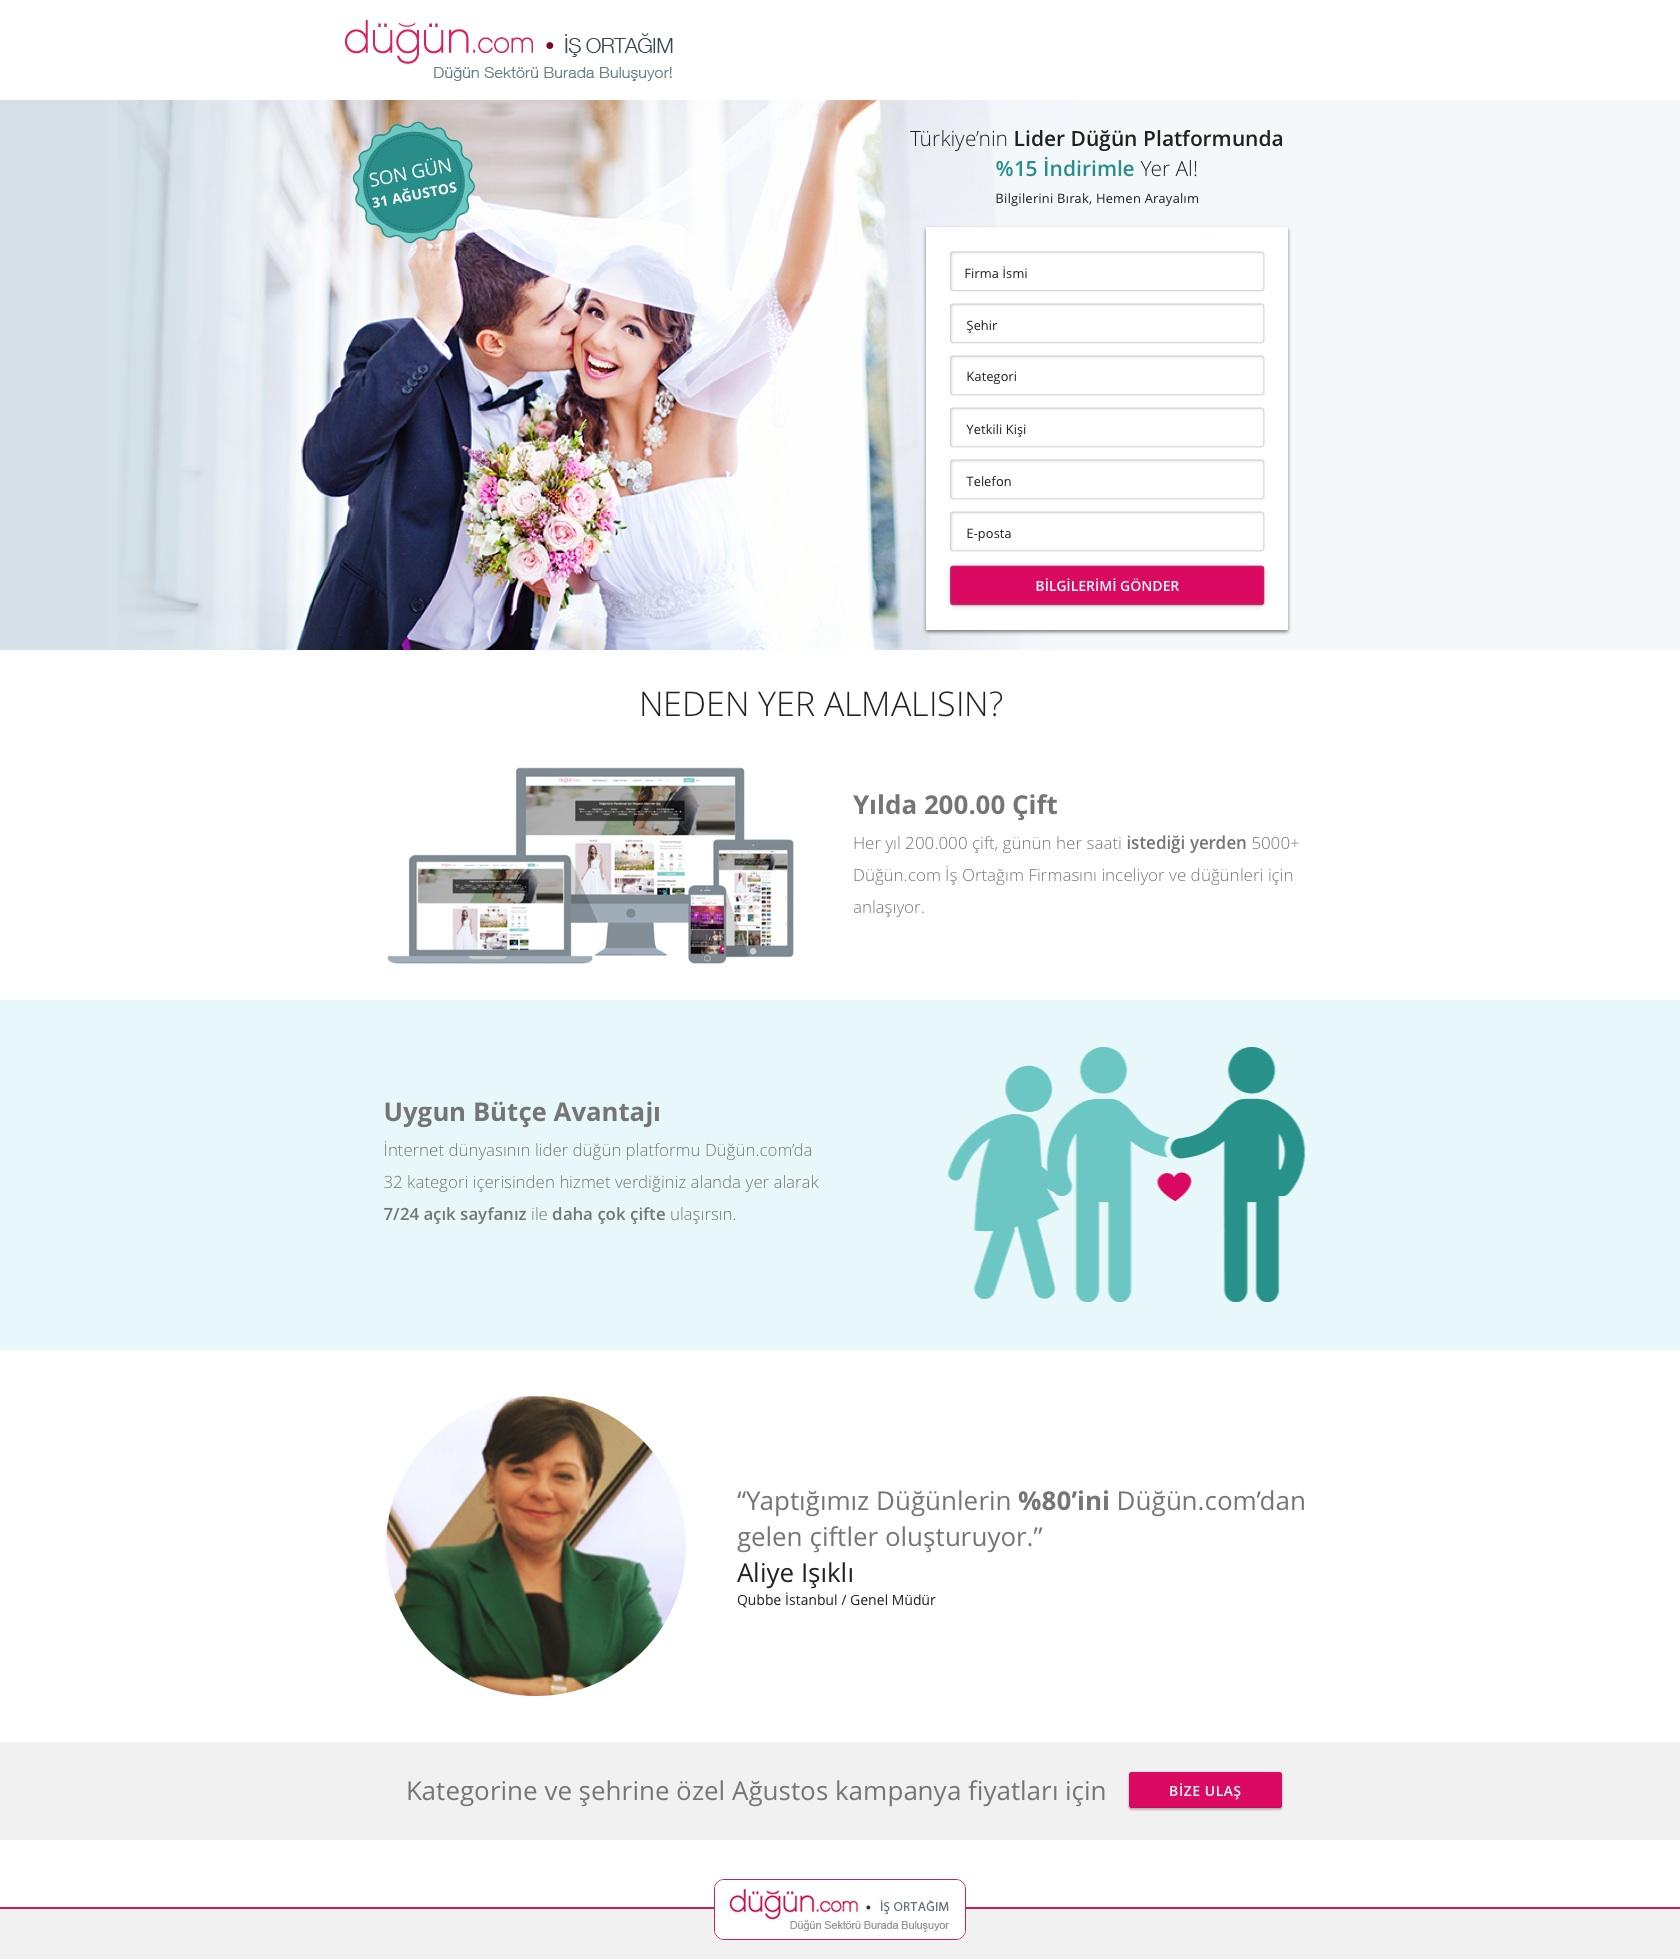 Dugun.com B2B Mail Landing Page